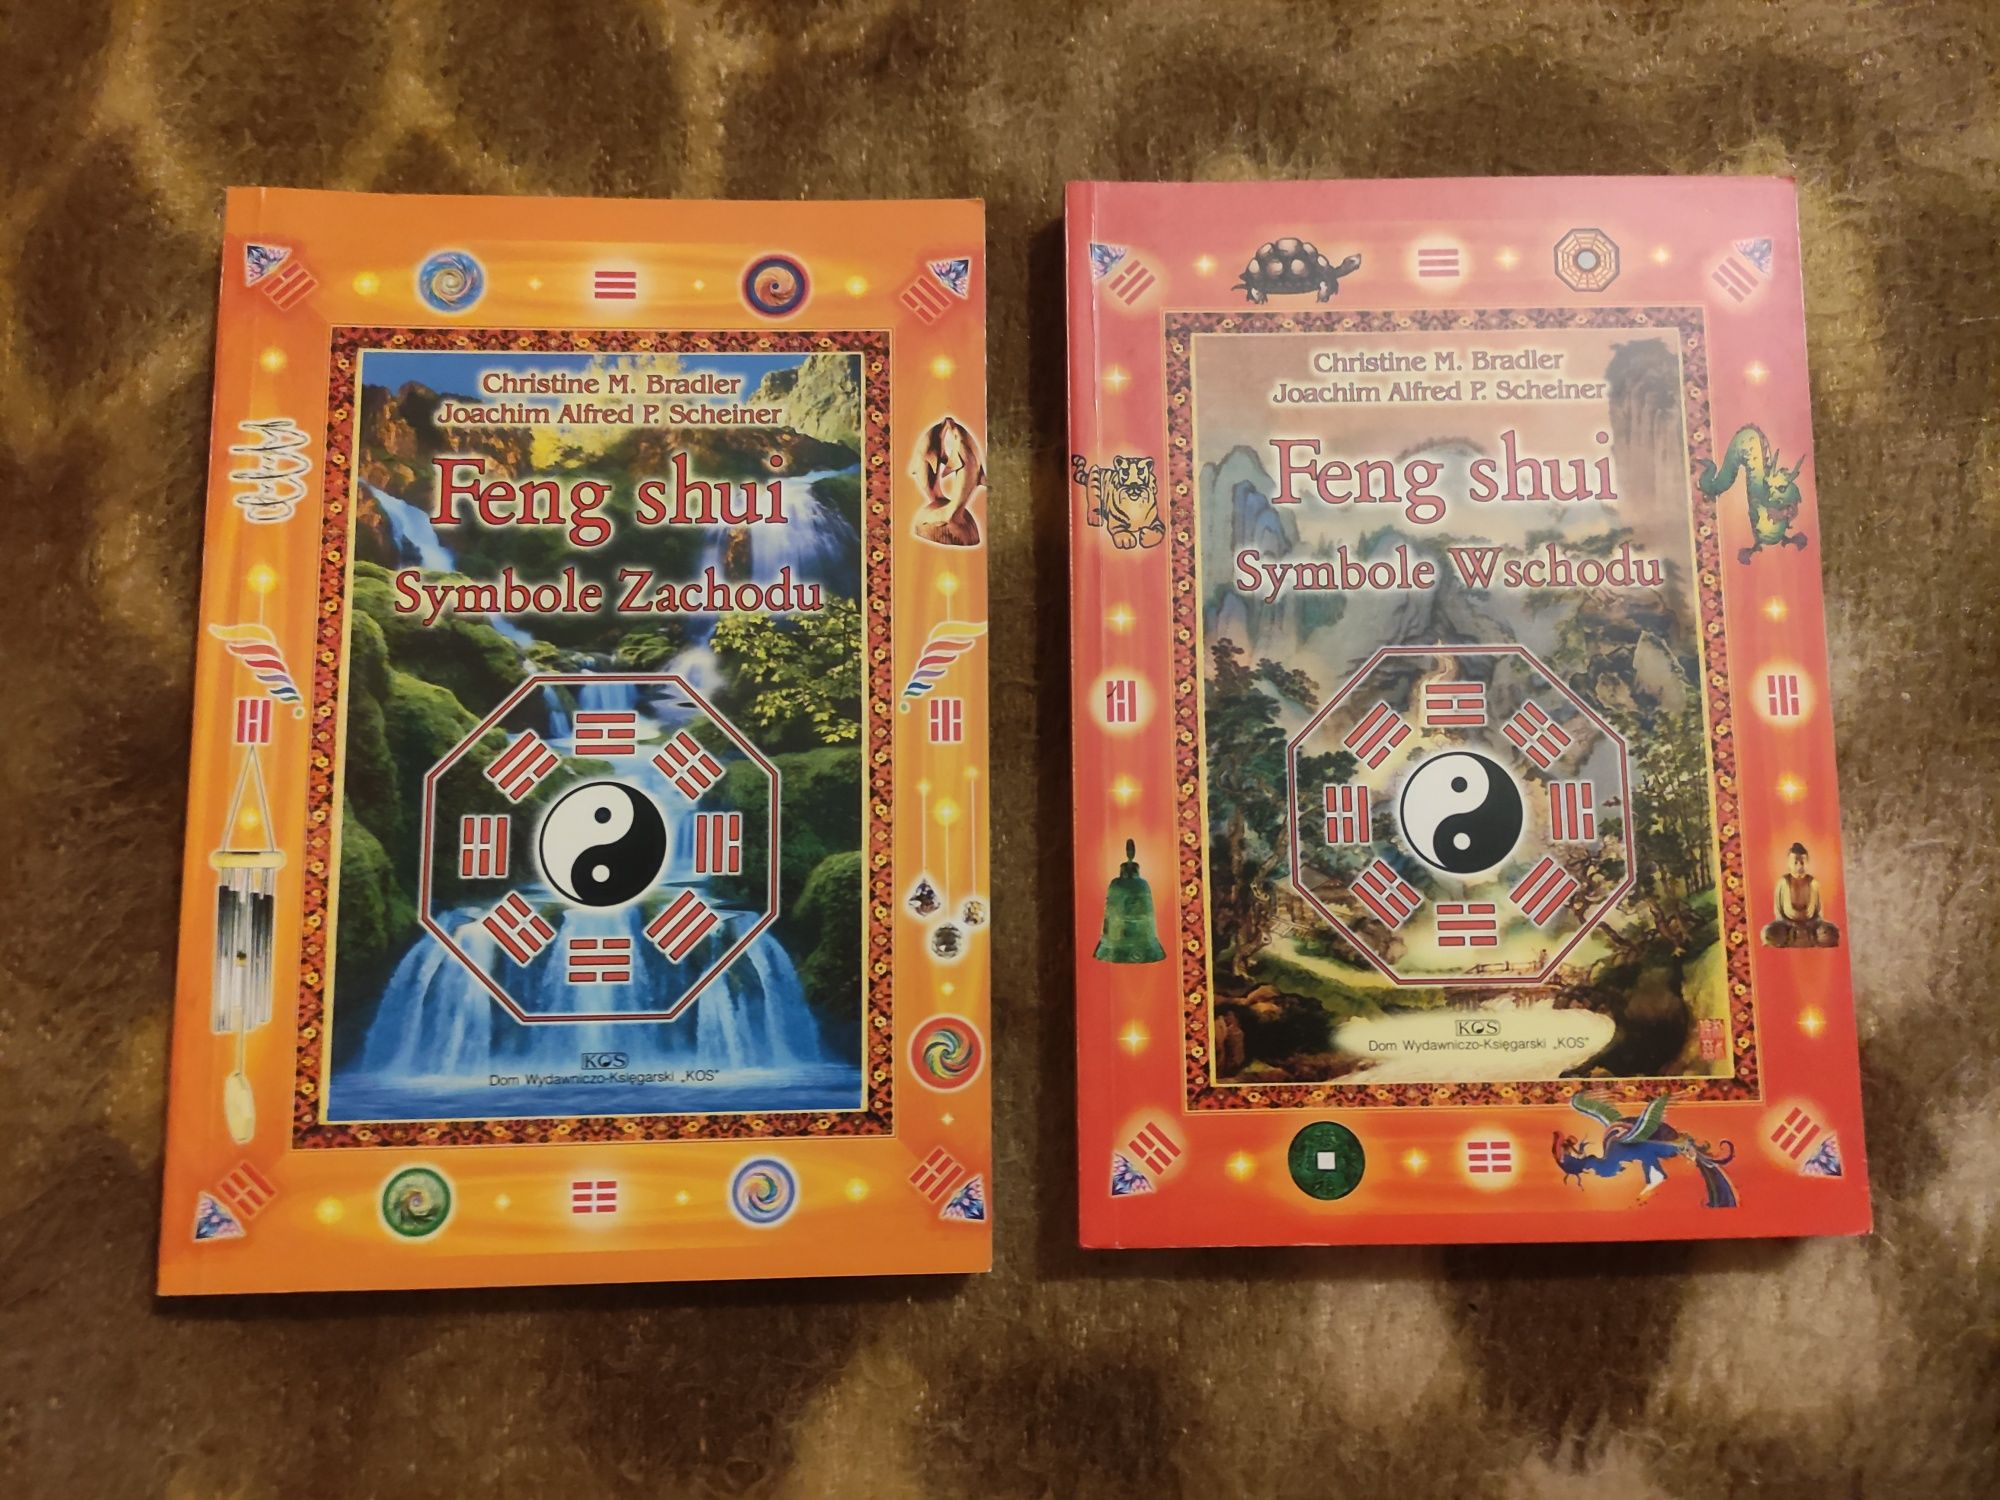 Feng shui symbole wschodu i zachodu, 2 książki Bradler, Scheiner